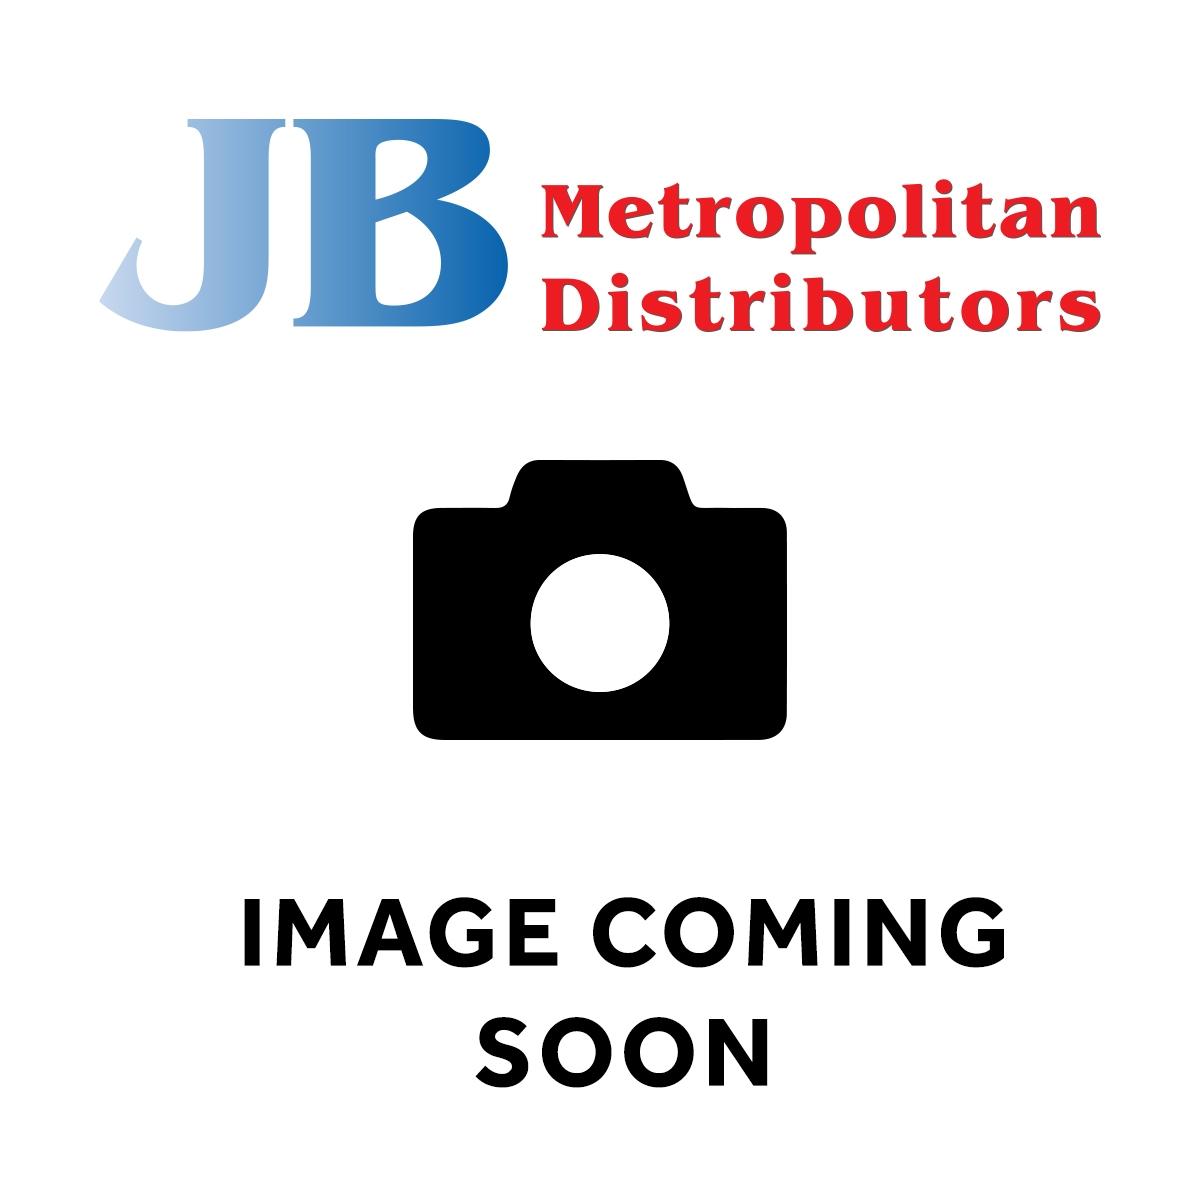 170G STARBURST FRUIT CHEWS